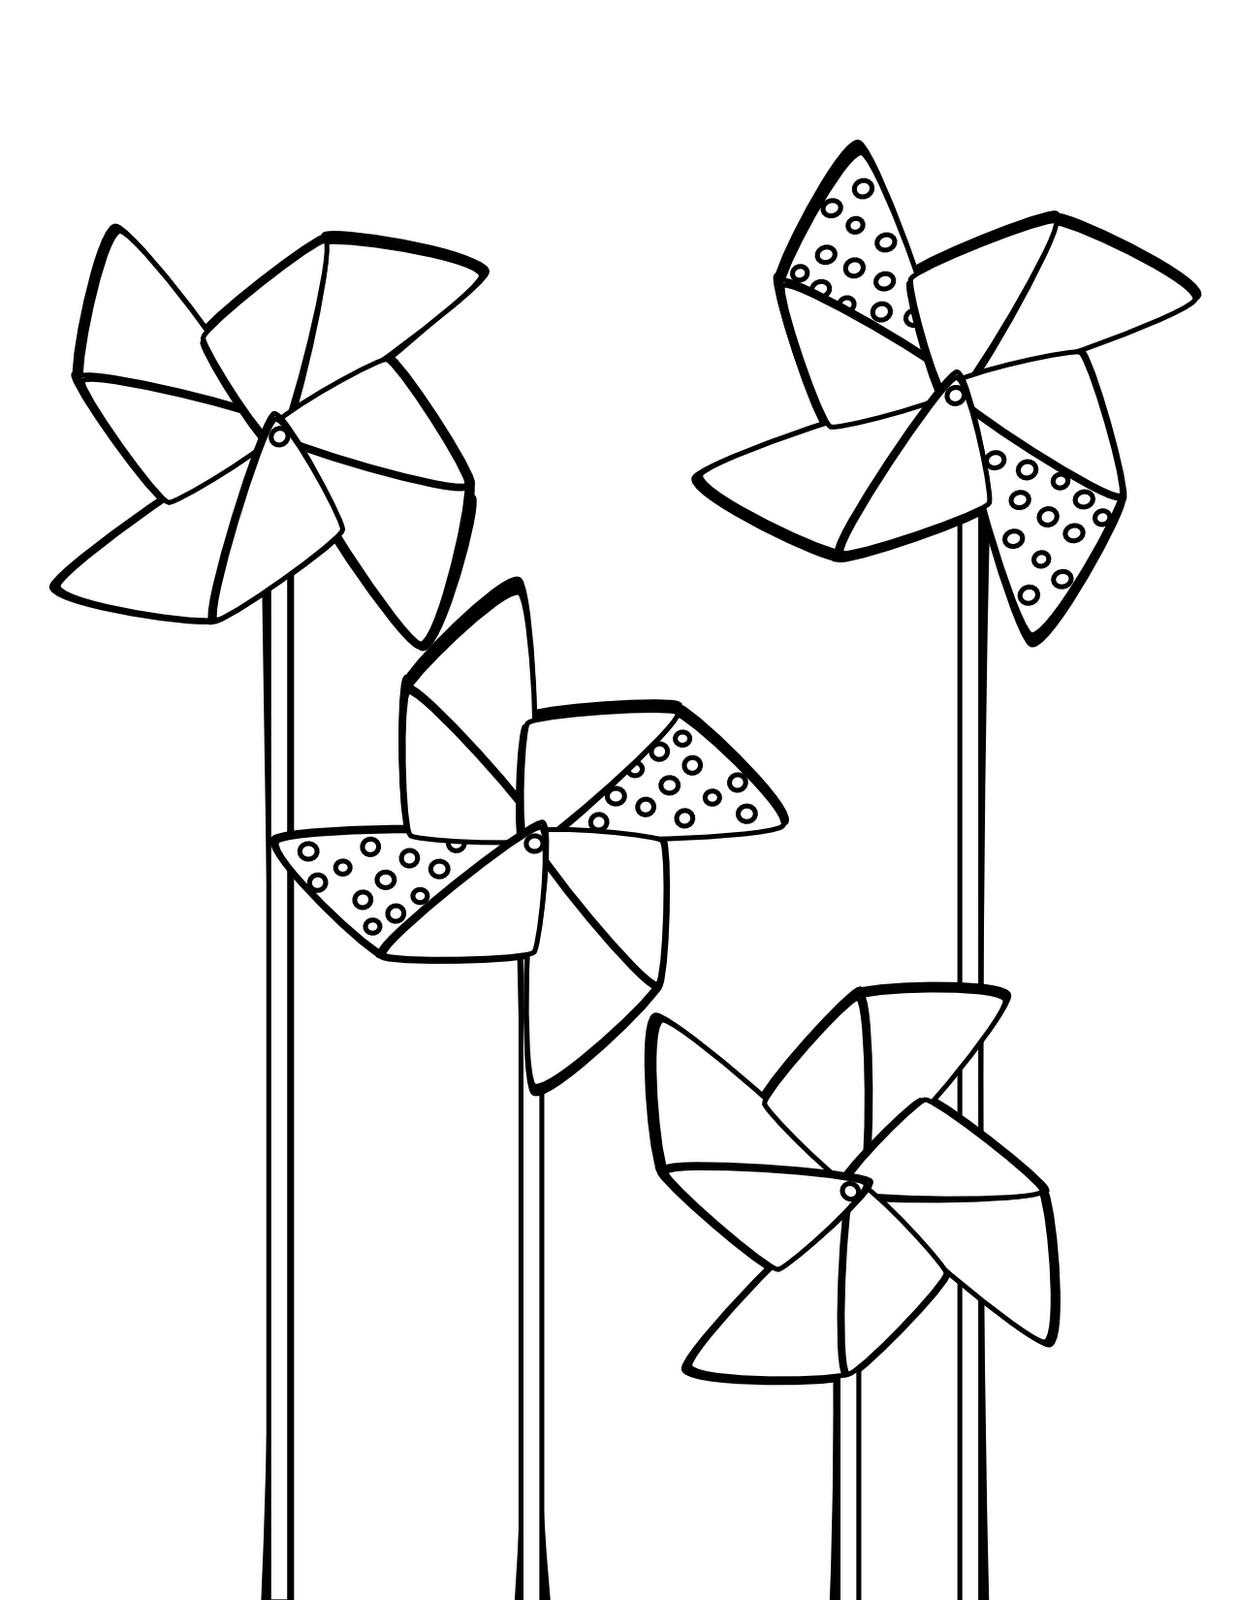 triciarennea illustrator coloring page embroidery